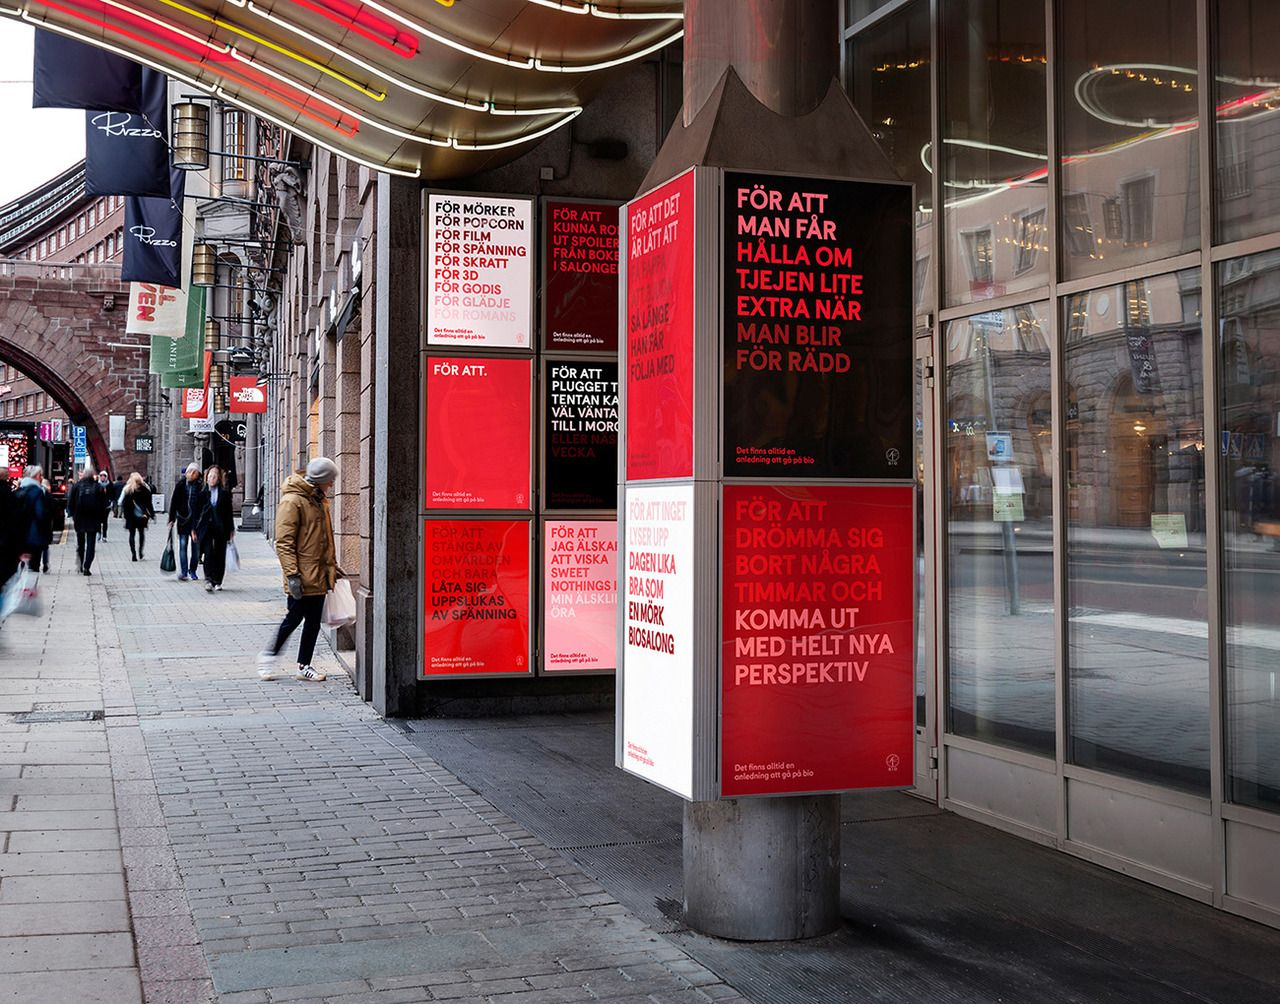 SF Bio Cinema Branding by Söderhavet  http://mindsparklemag.com/design/sf-bio-cinema-branding/